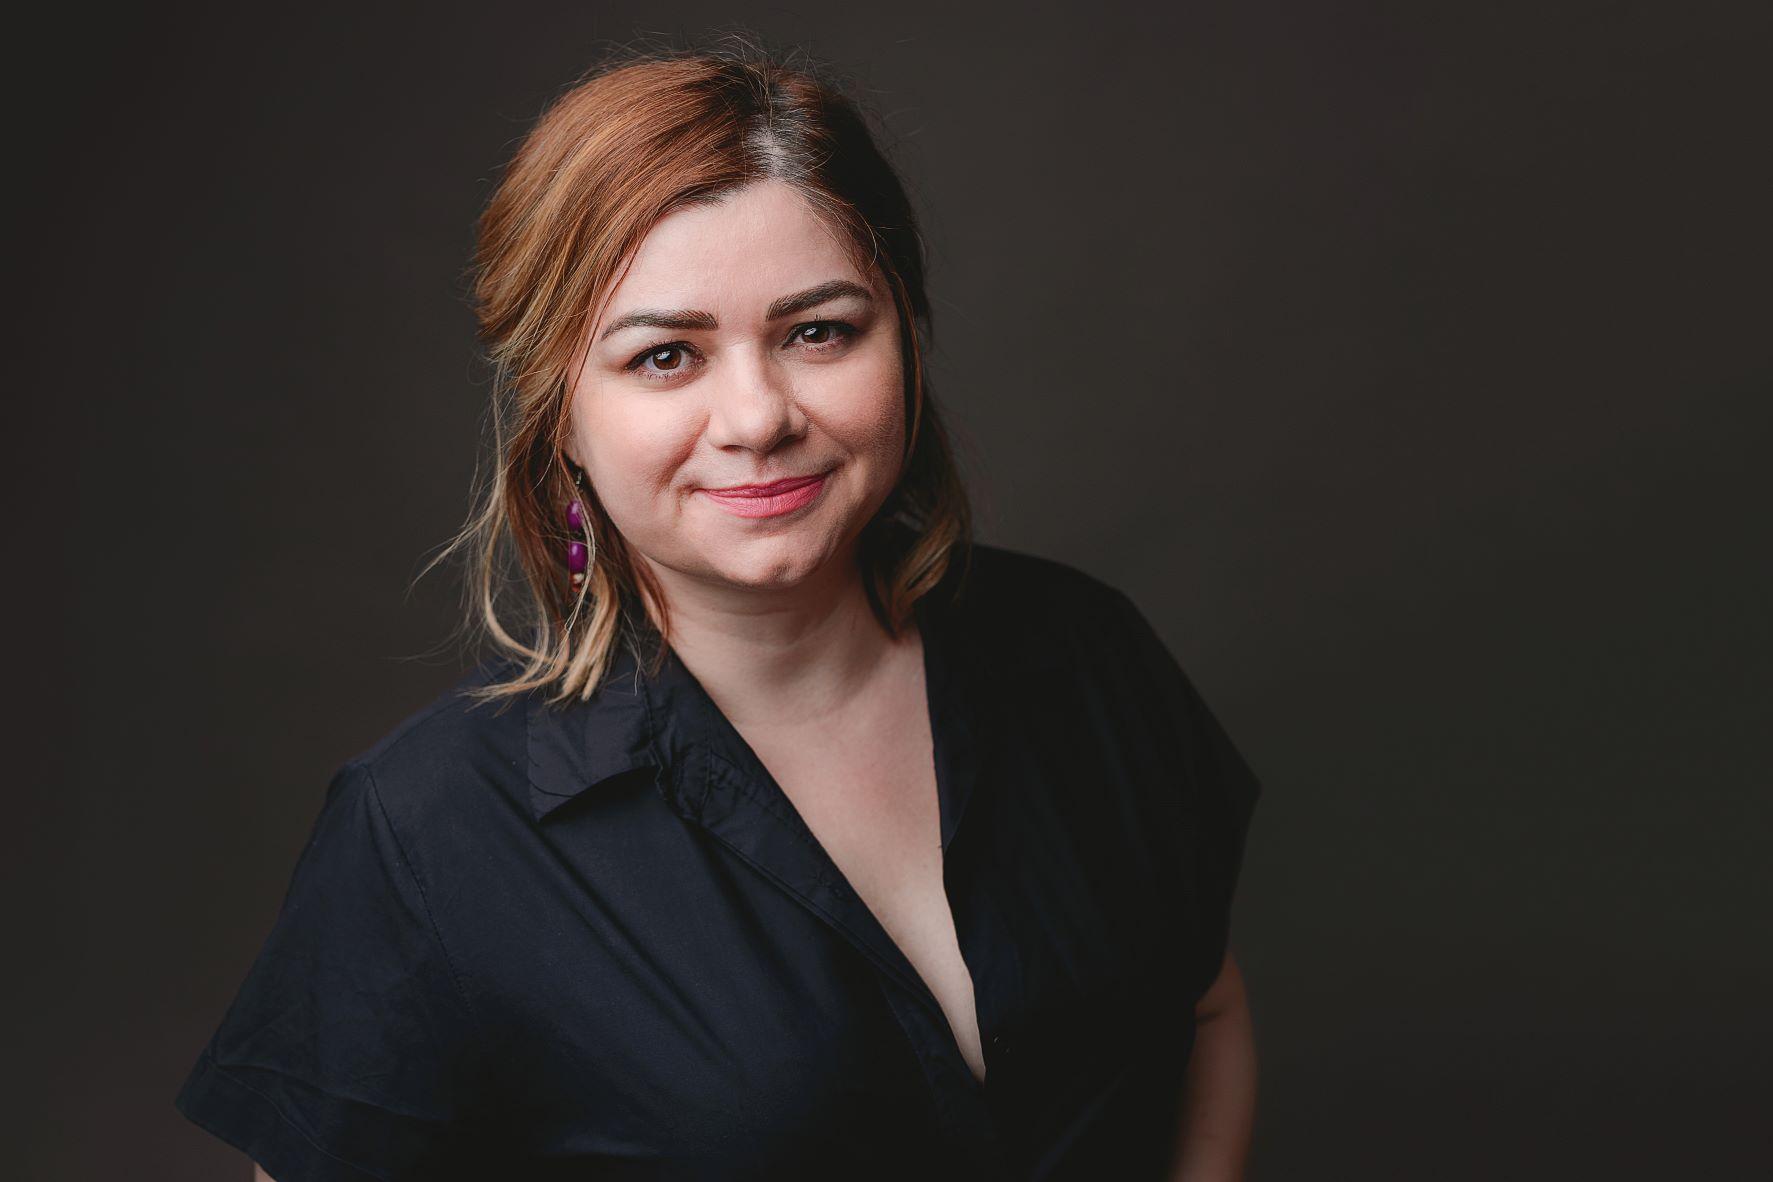 CIEL România: The future belongs to the digitalized companies